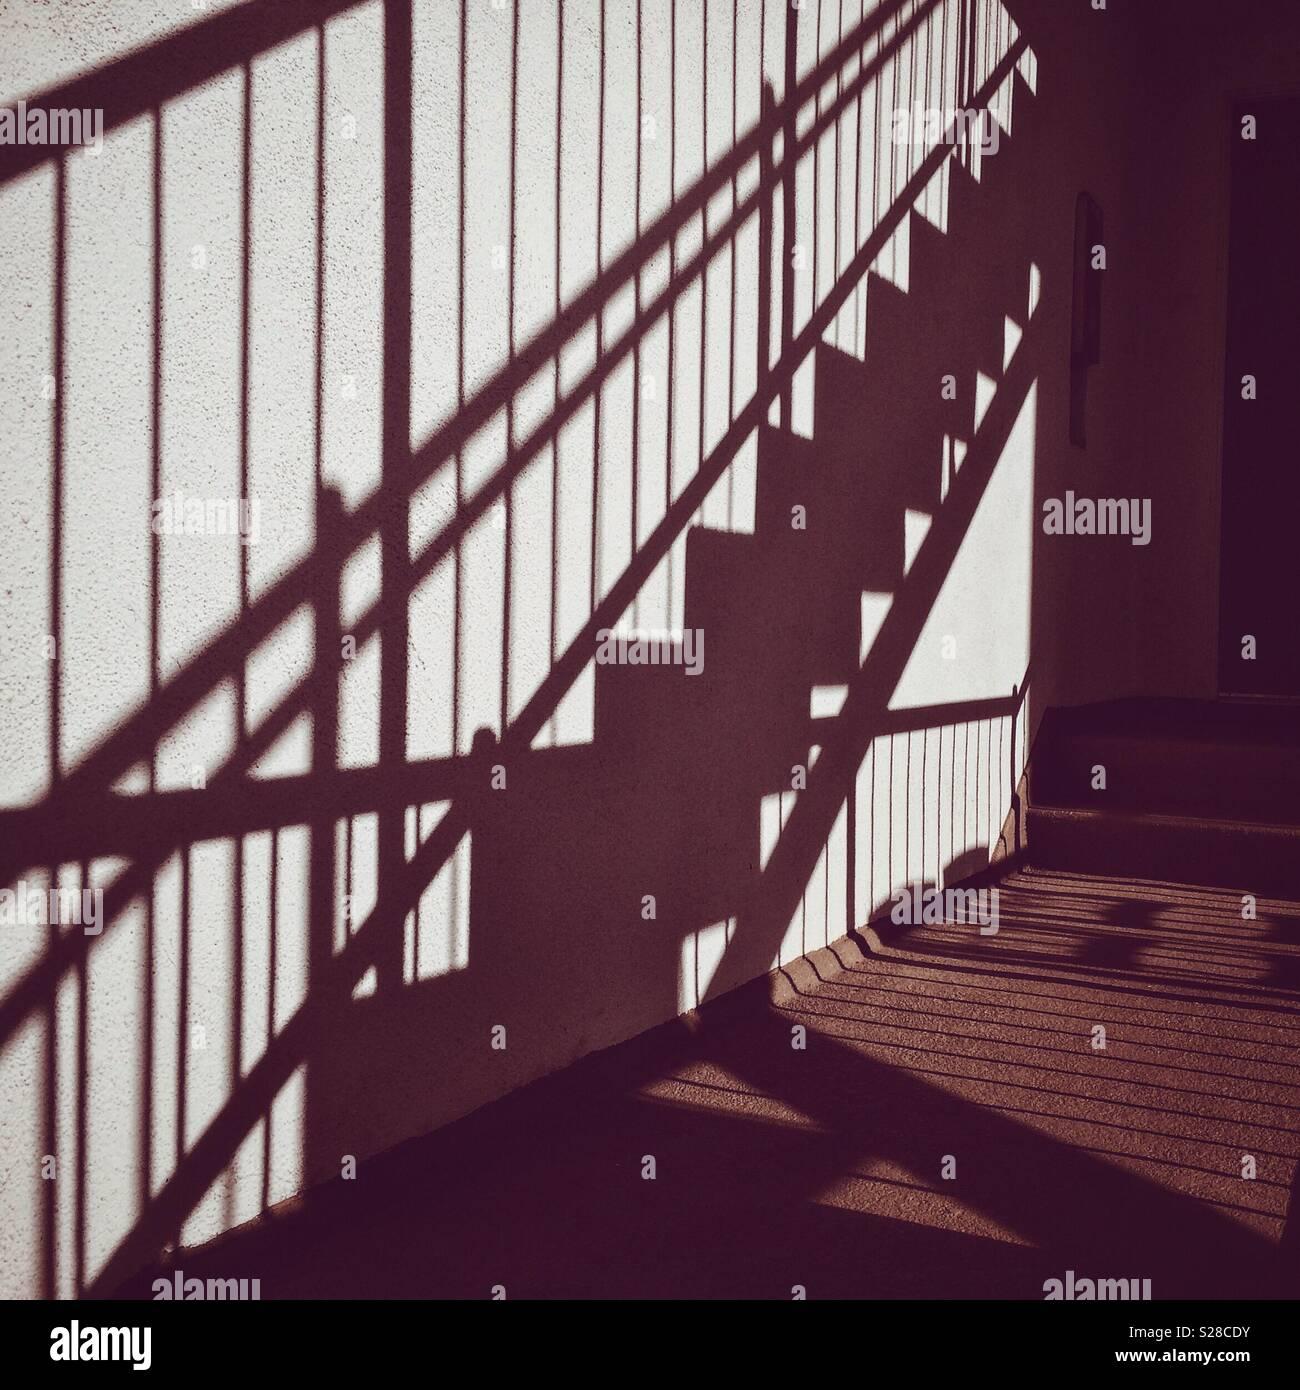 shadows of stairs against a wall in El Porto, California near Manhattan Beach - Stock Image